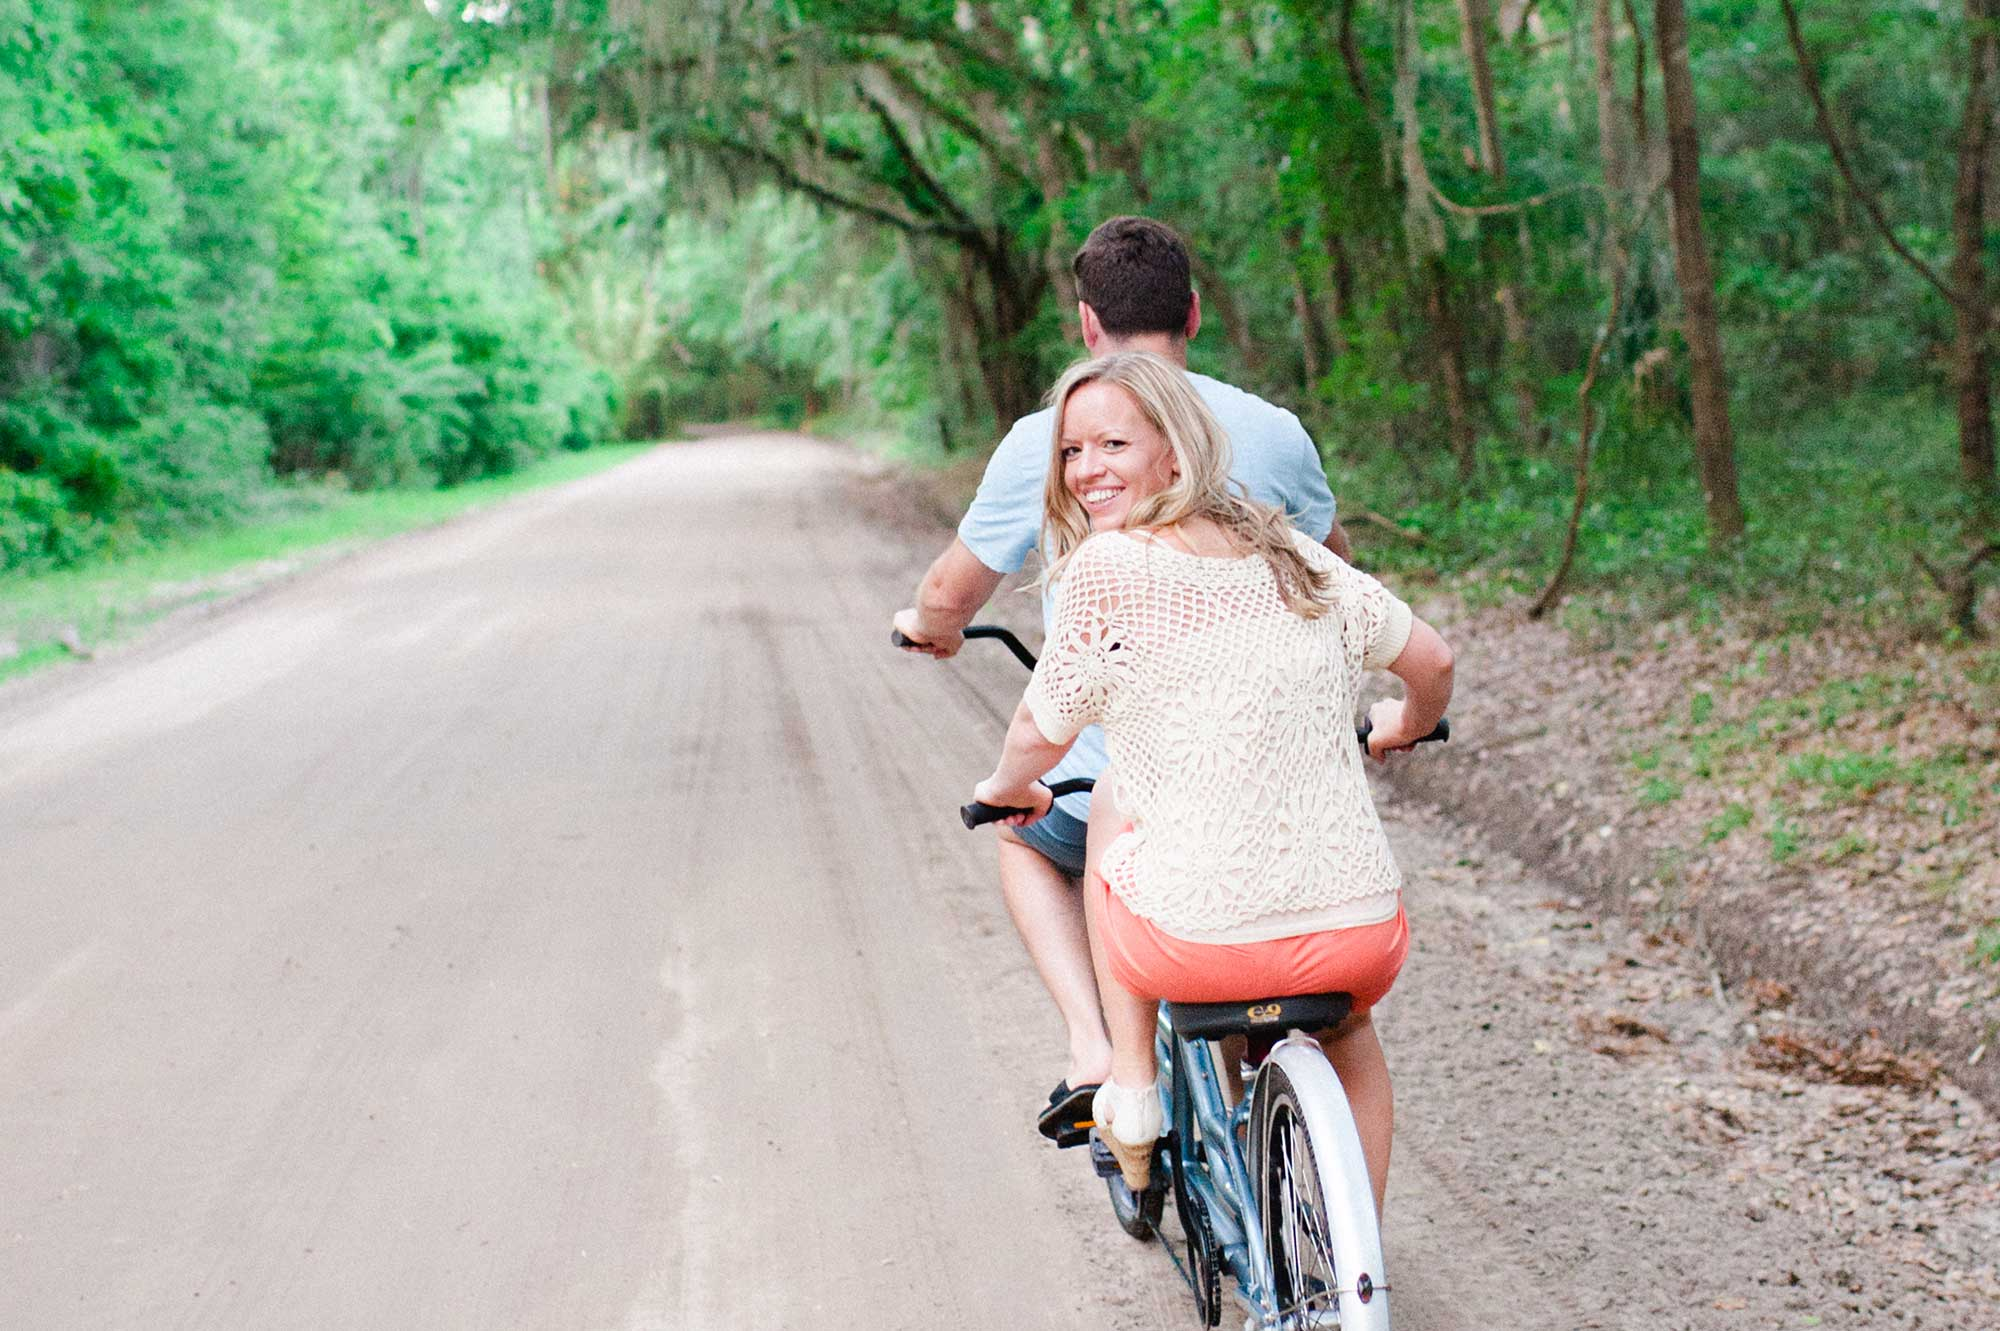 Cycling-WEB-crop.jpg